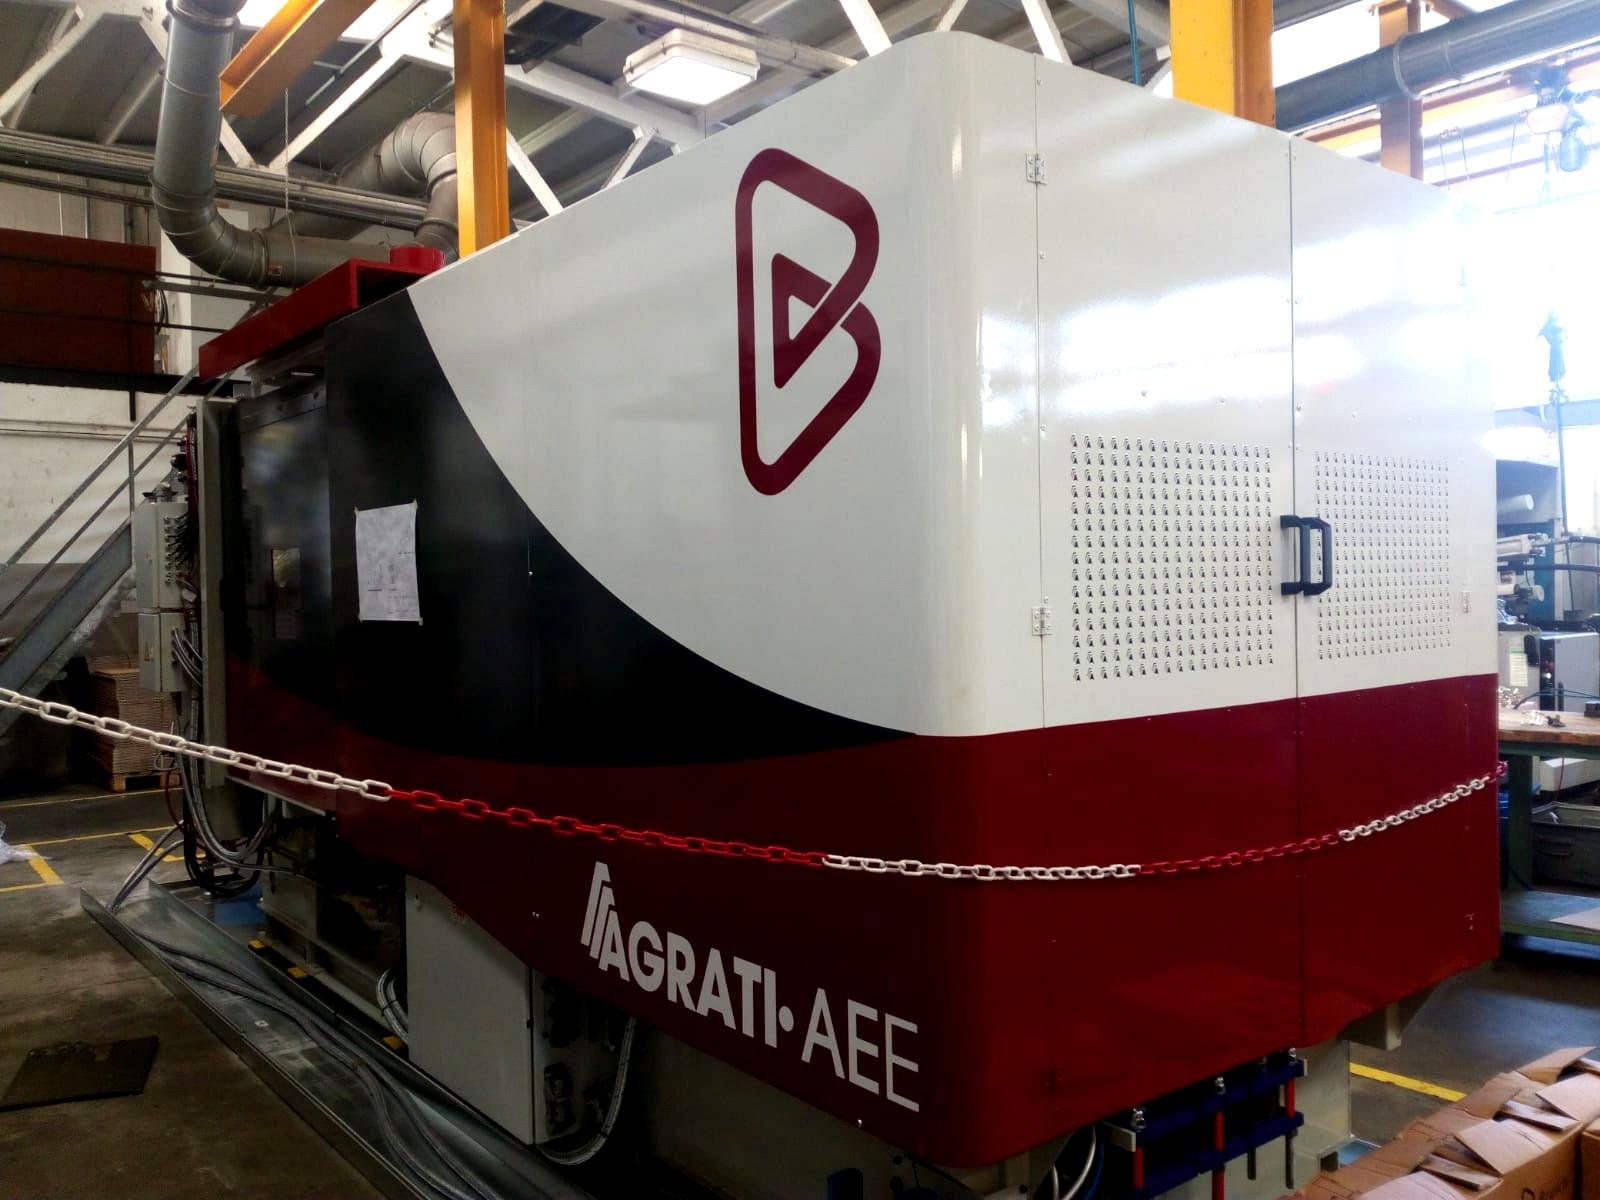 Industrial machinery: Bruschi's new die casting machines